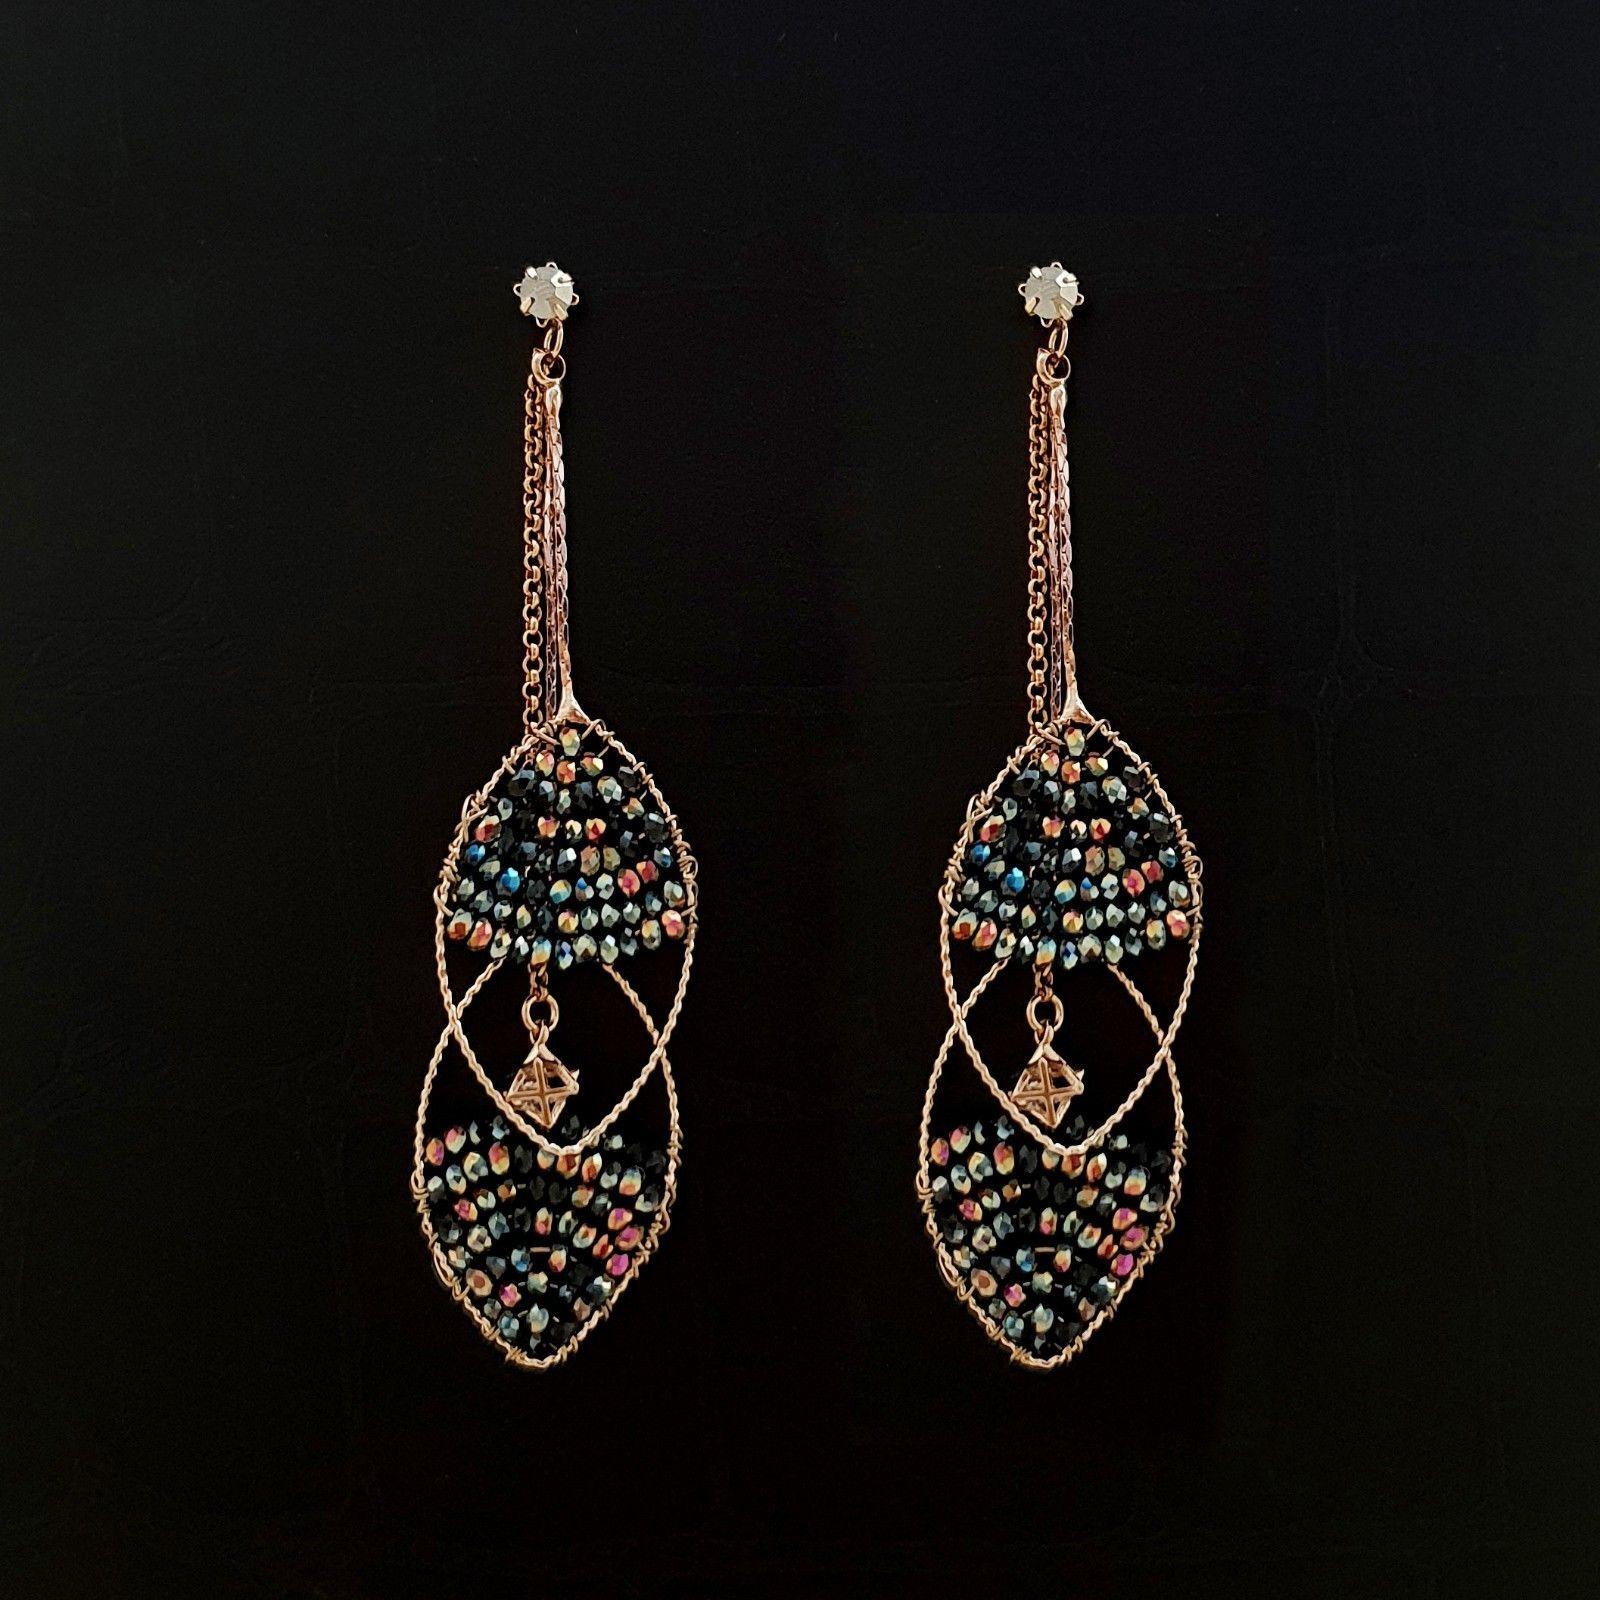 Handmade Oval Ellipse Made With Swarovski Stone Drop Dangle Earrings Brass E201 image 7